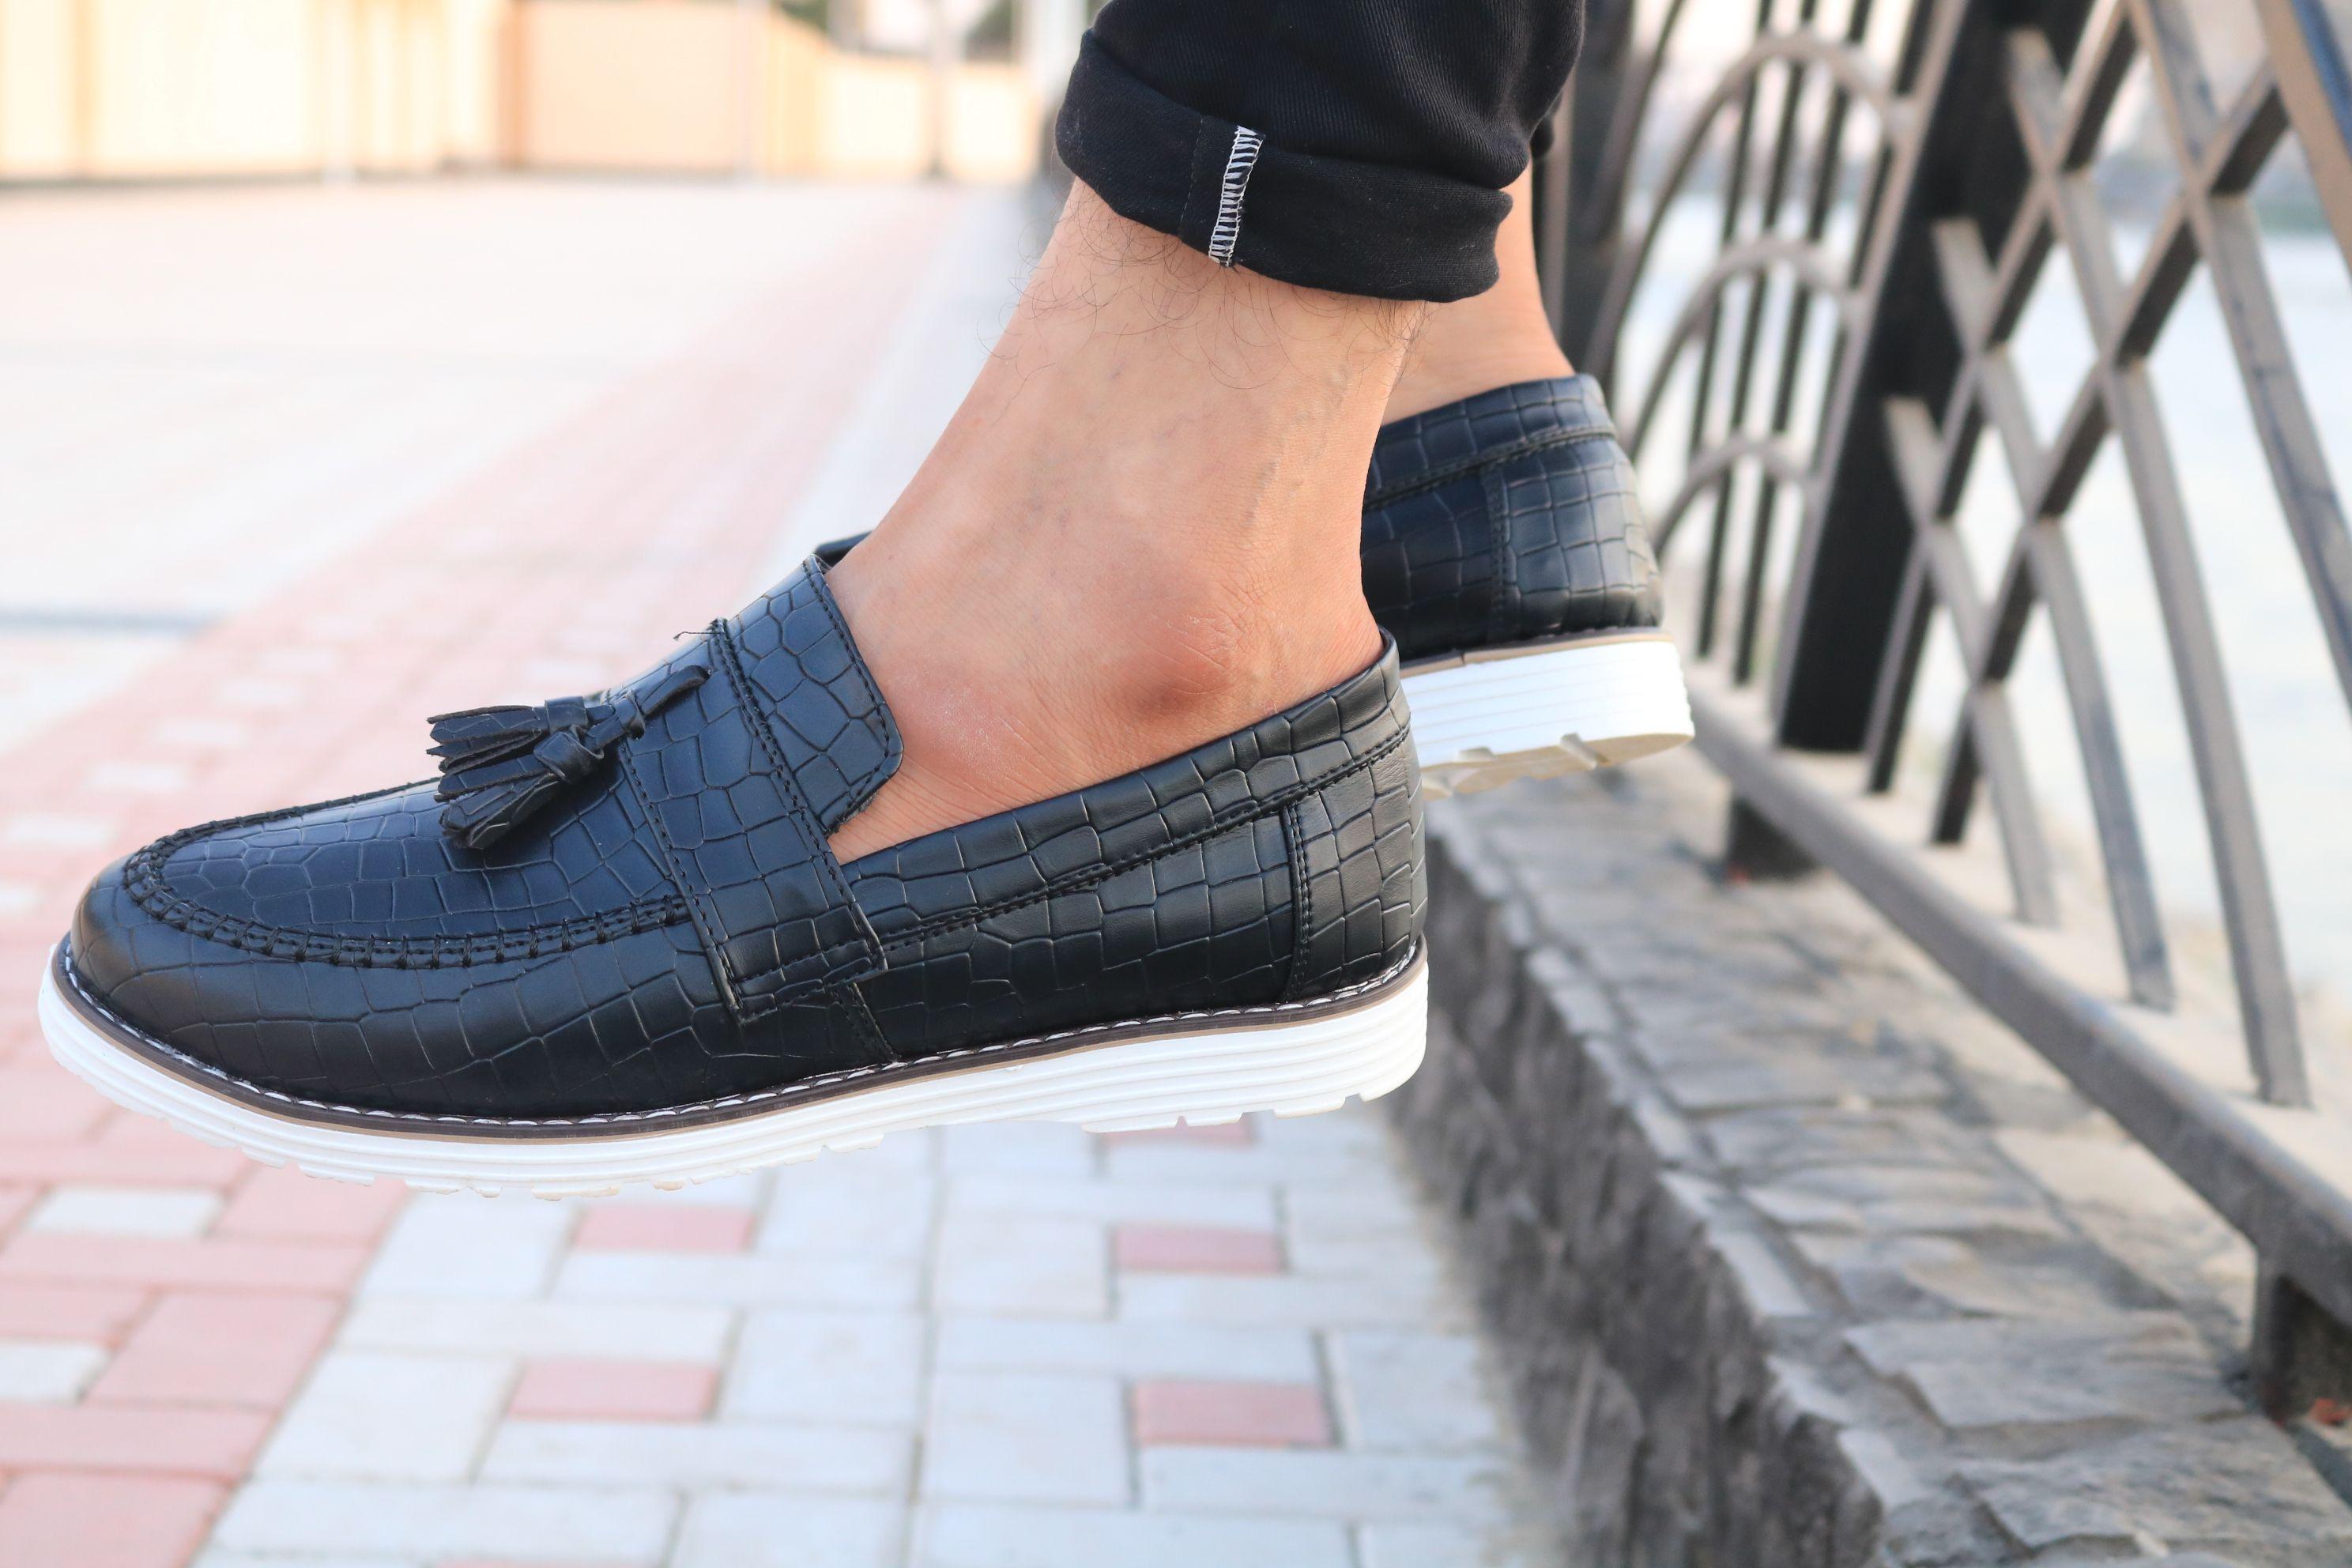 جزمة رزار بالابل علي الموضة ب 180ج Dress Shoes Men Loafers Men Dress Shoes